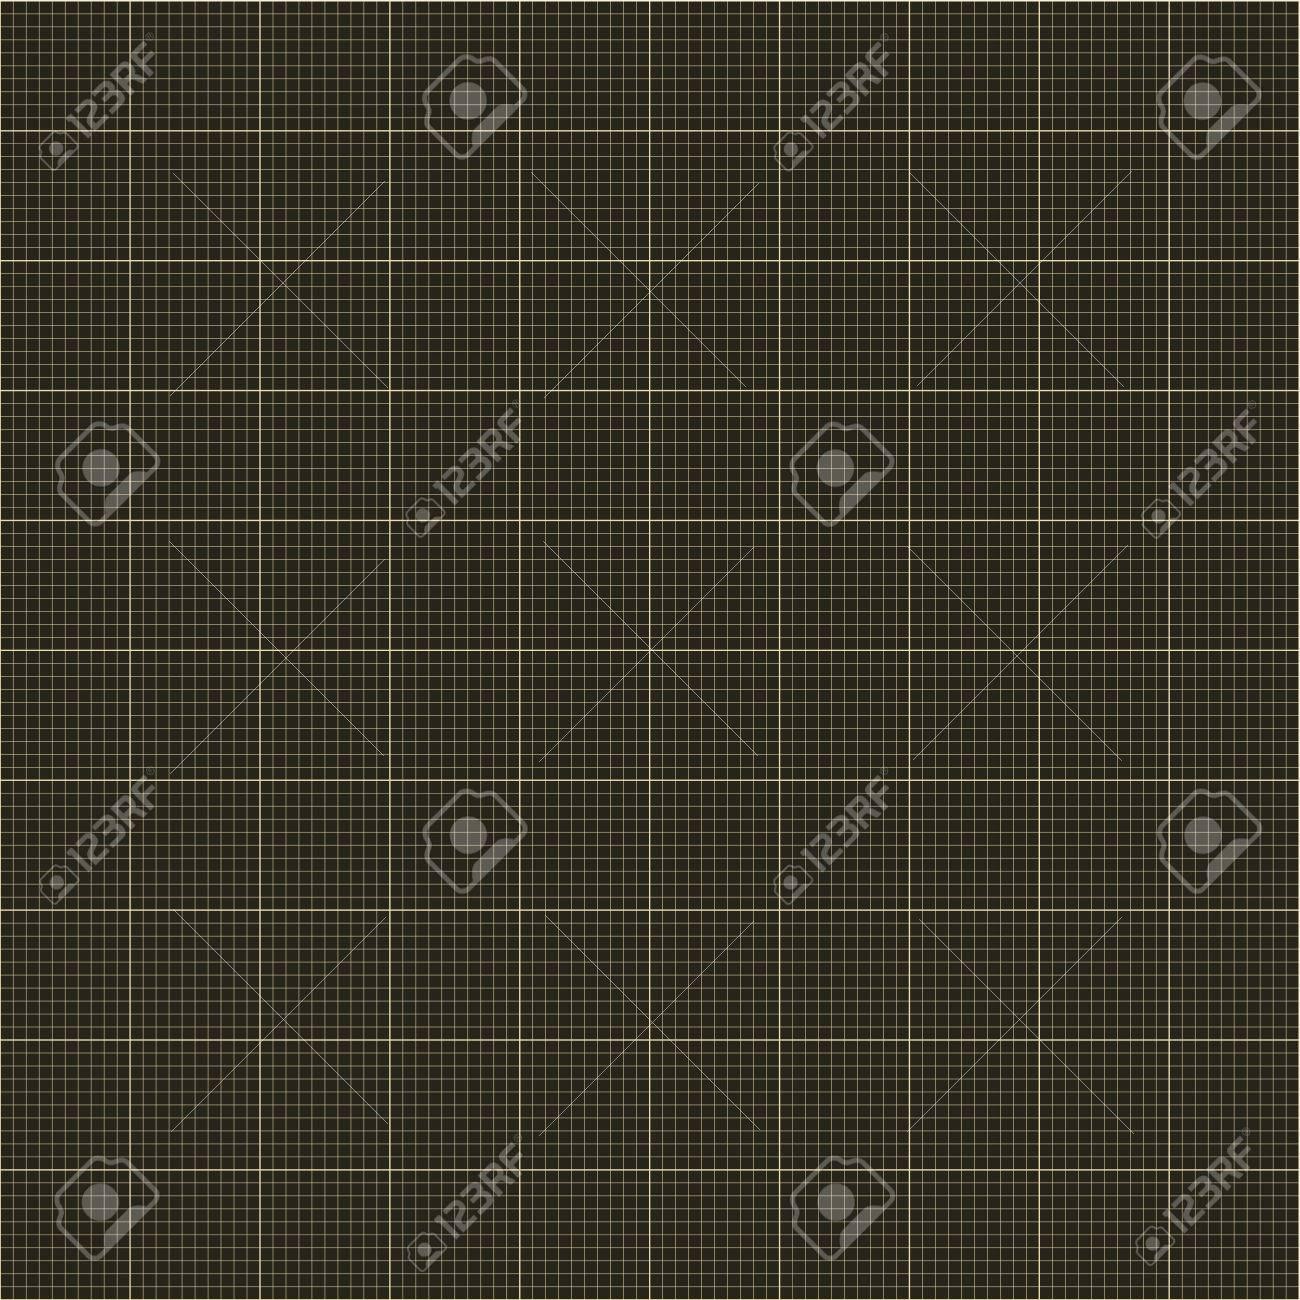 seamless millimeter grid graph paper engineering paper dark